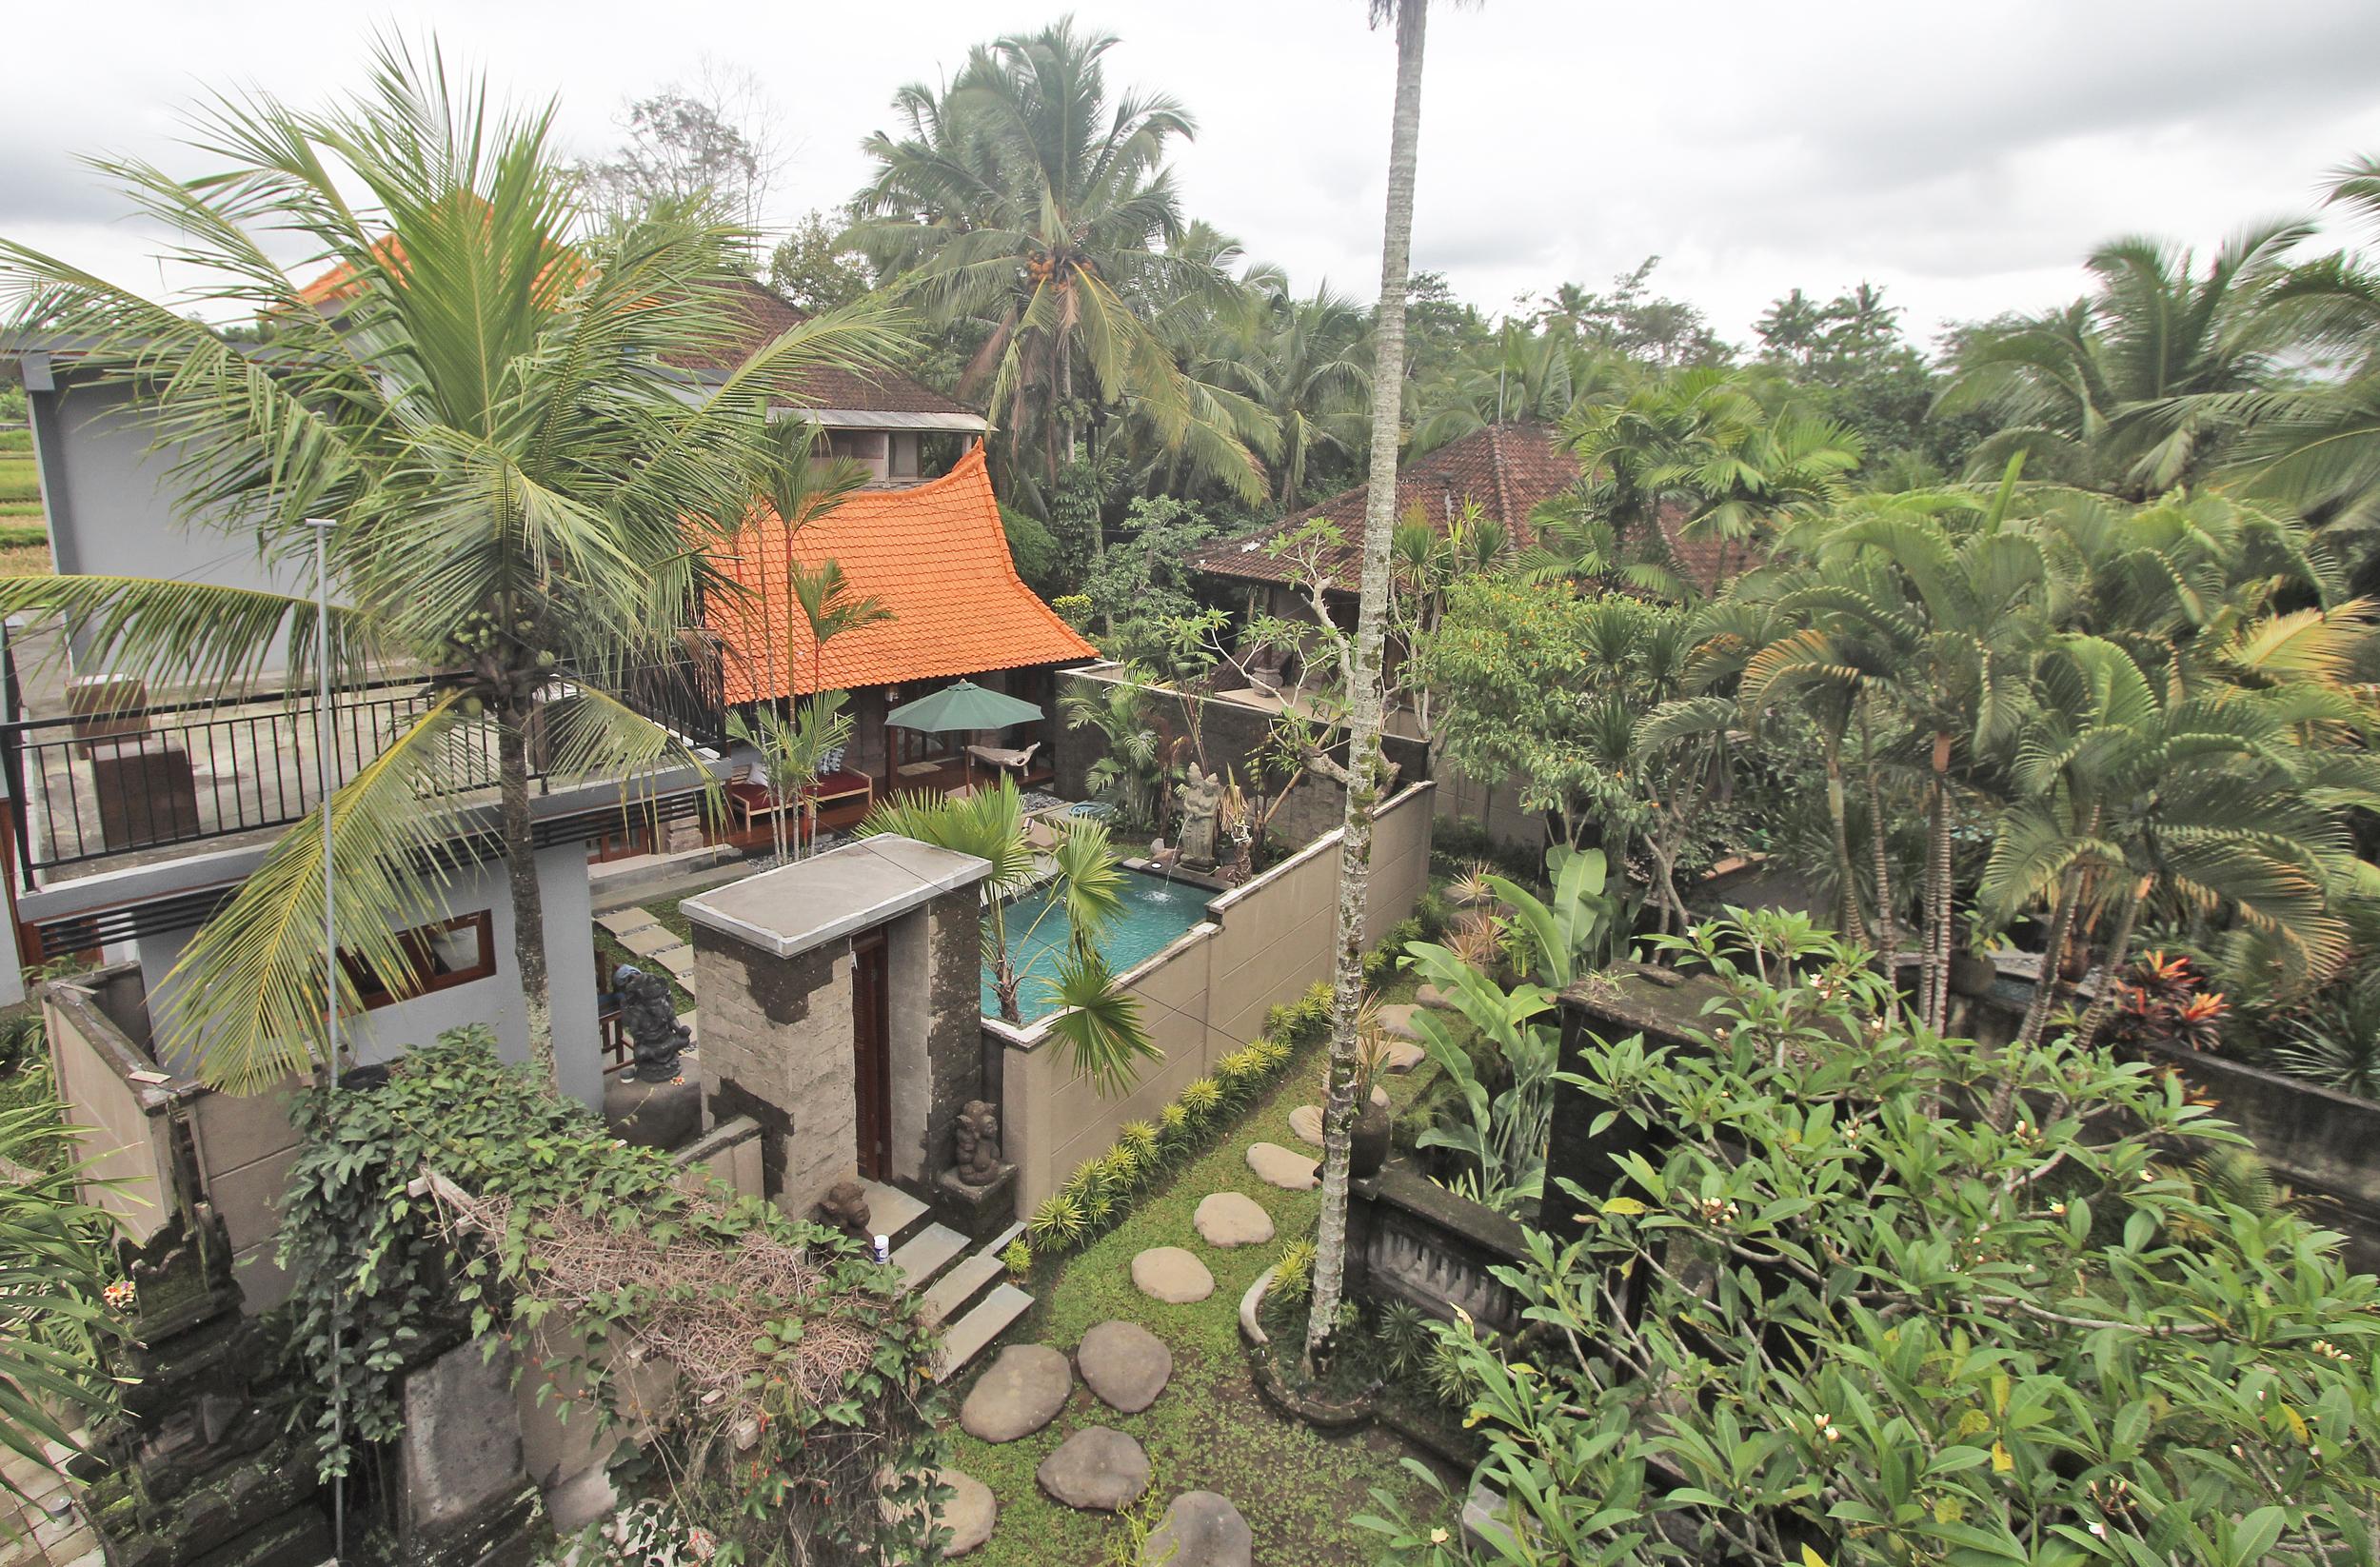 Cozy 2bedroom Villa With Private Pool Villa Orchid Villas For Rent In Ubud Bali Indonesia